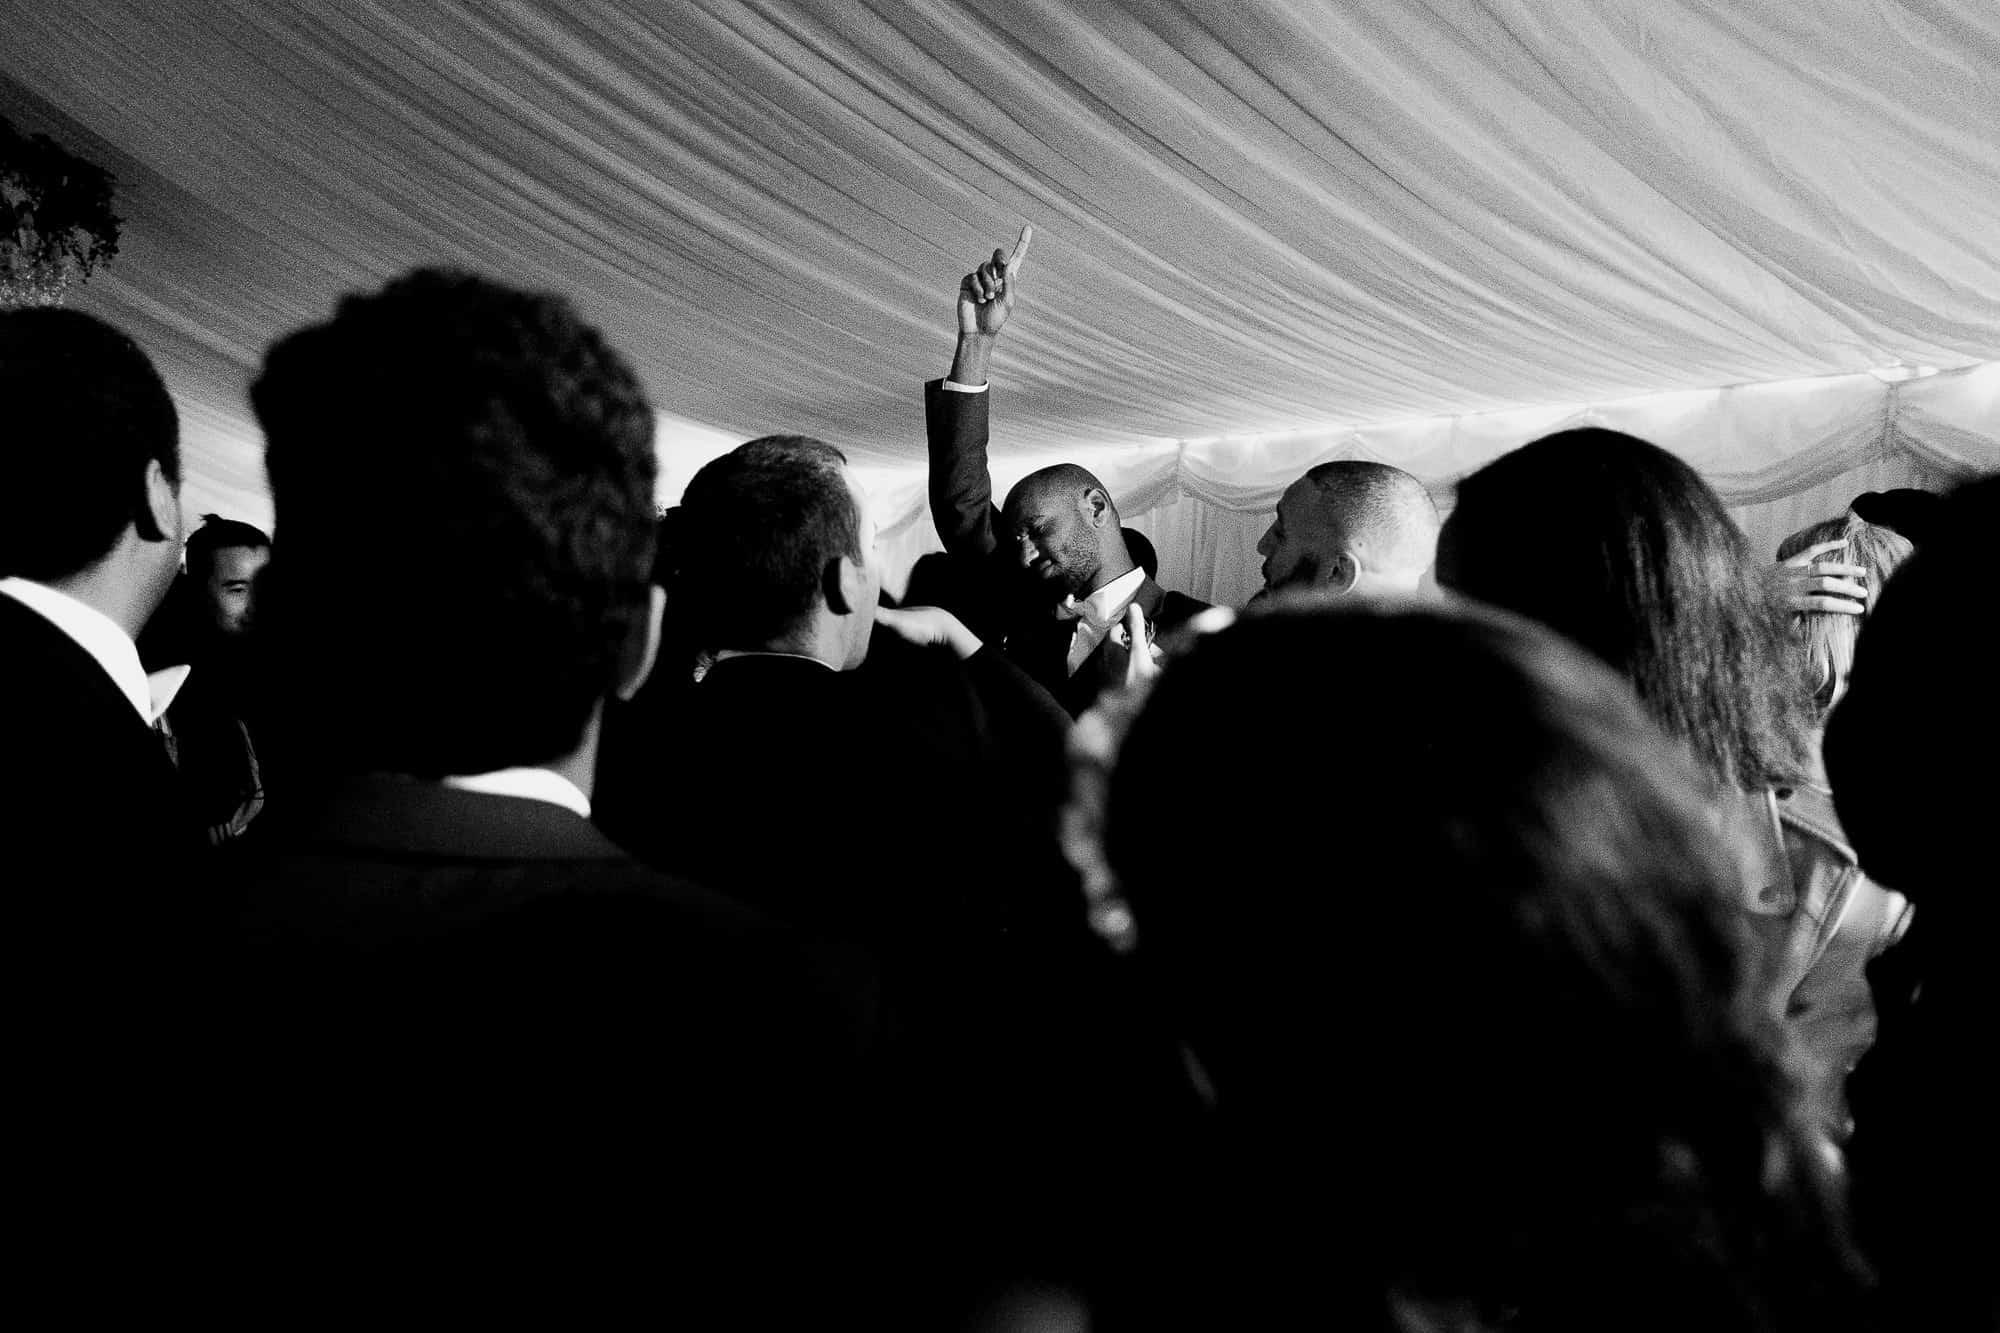 marleybrook-house-wedding-photography-matt-tyler-0066